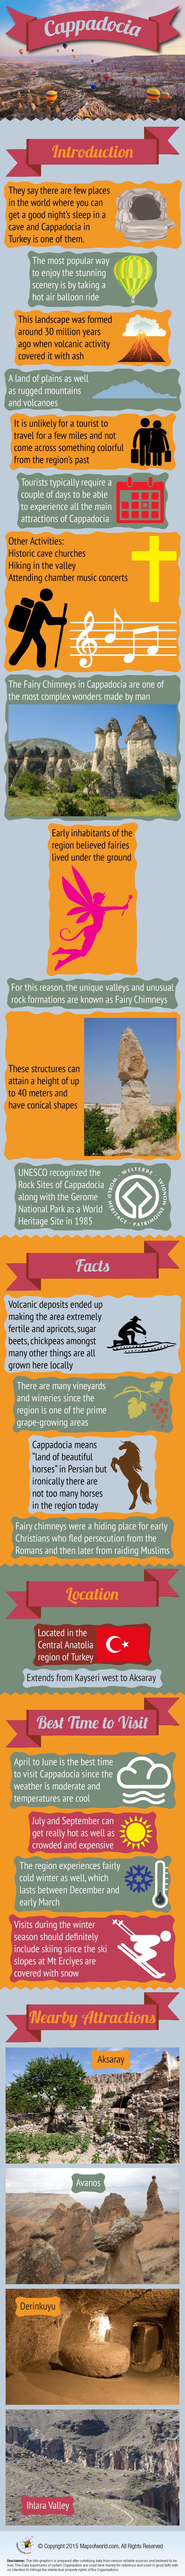 Cappadocia, Turkey - Facts & Infographic